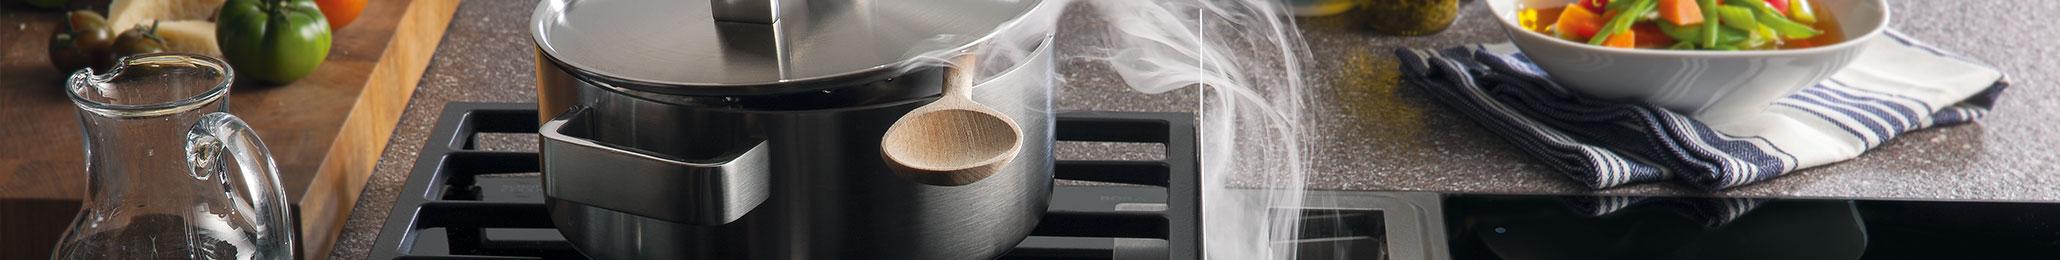 Bora professional - Küchen von Kieppe aus Arnstadt - Downdraft - Dunstabzug am Kochfeld